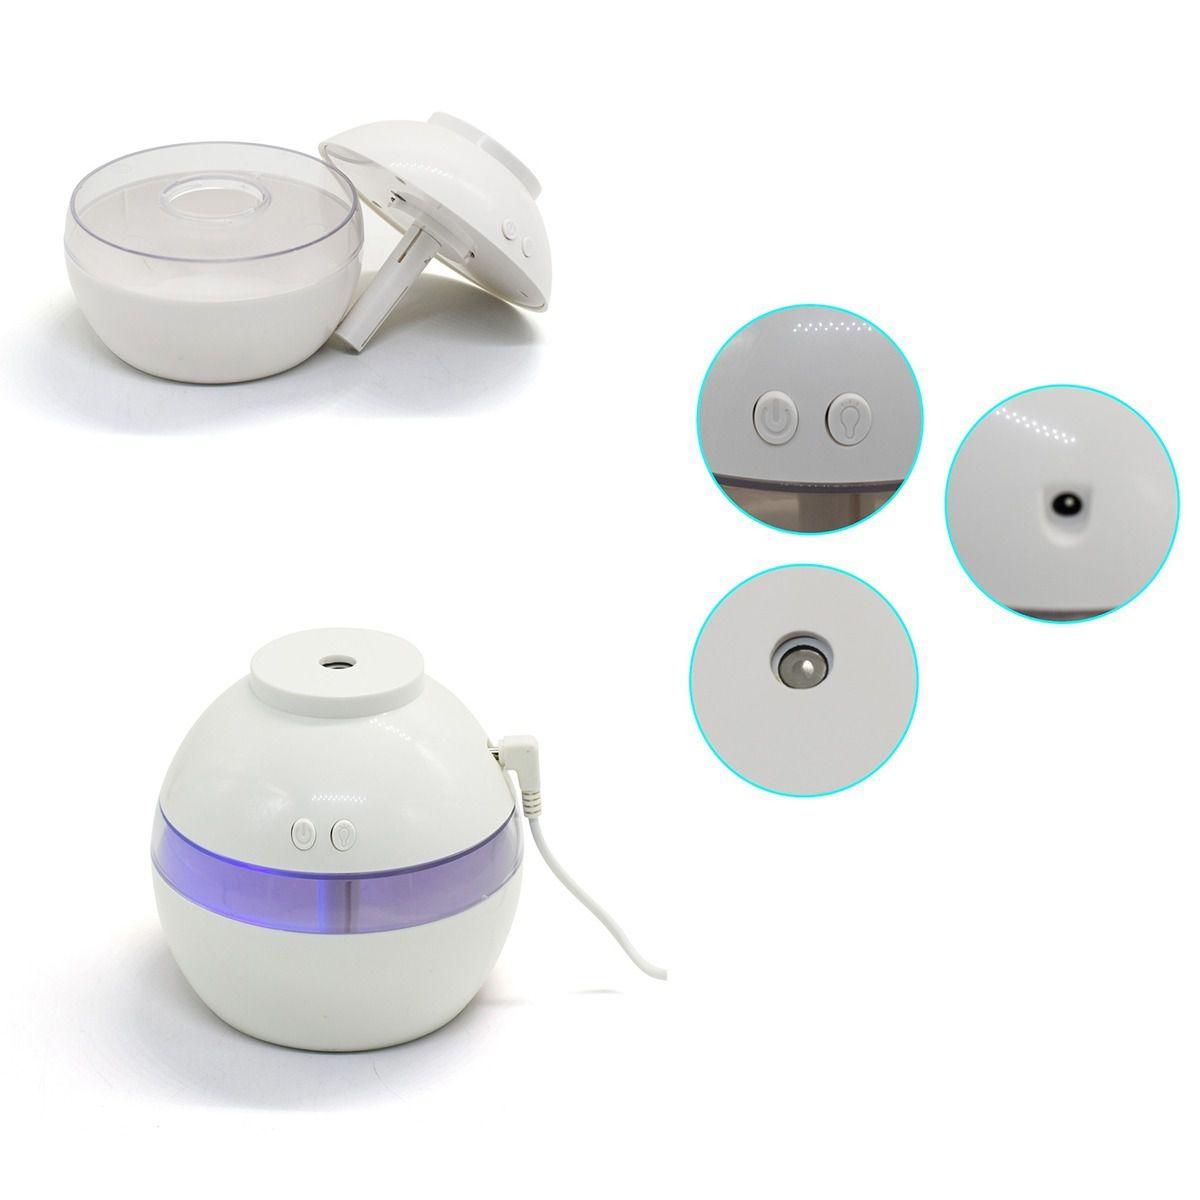 Pulverizador Aromatizador Umidificador Usb Ultrassônico